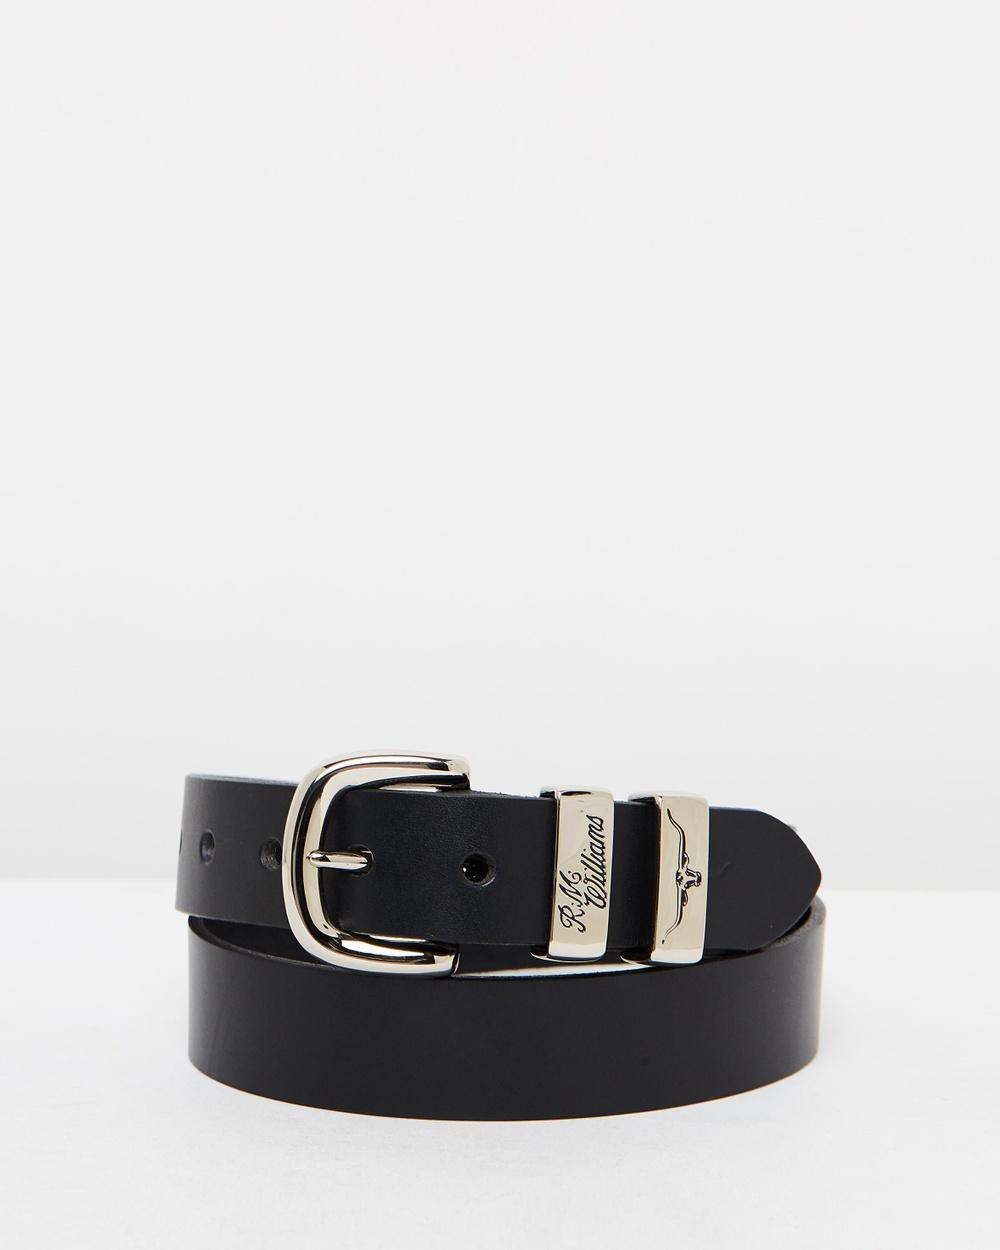 "R.M.Williams 1 4"" 3 Piece Sold Hide Belt Belts Black 1-4"""